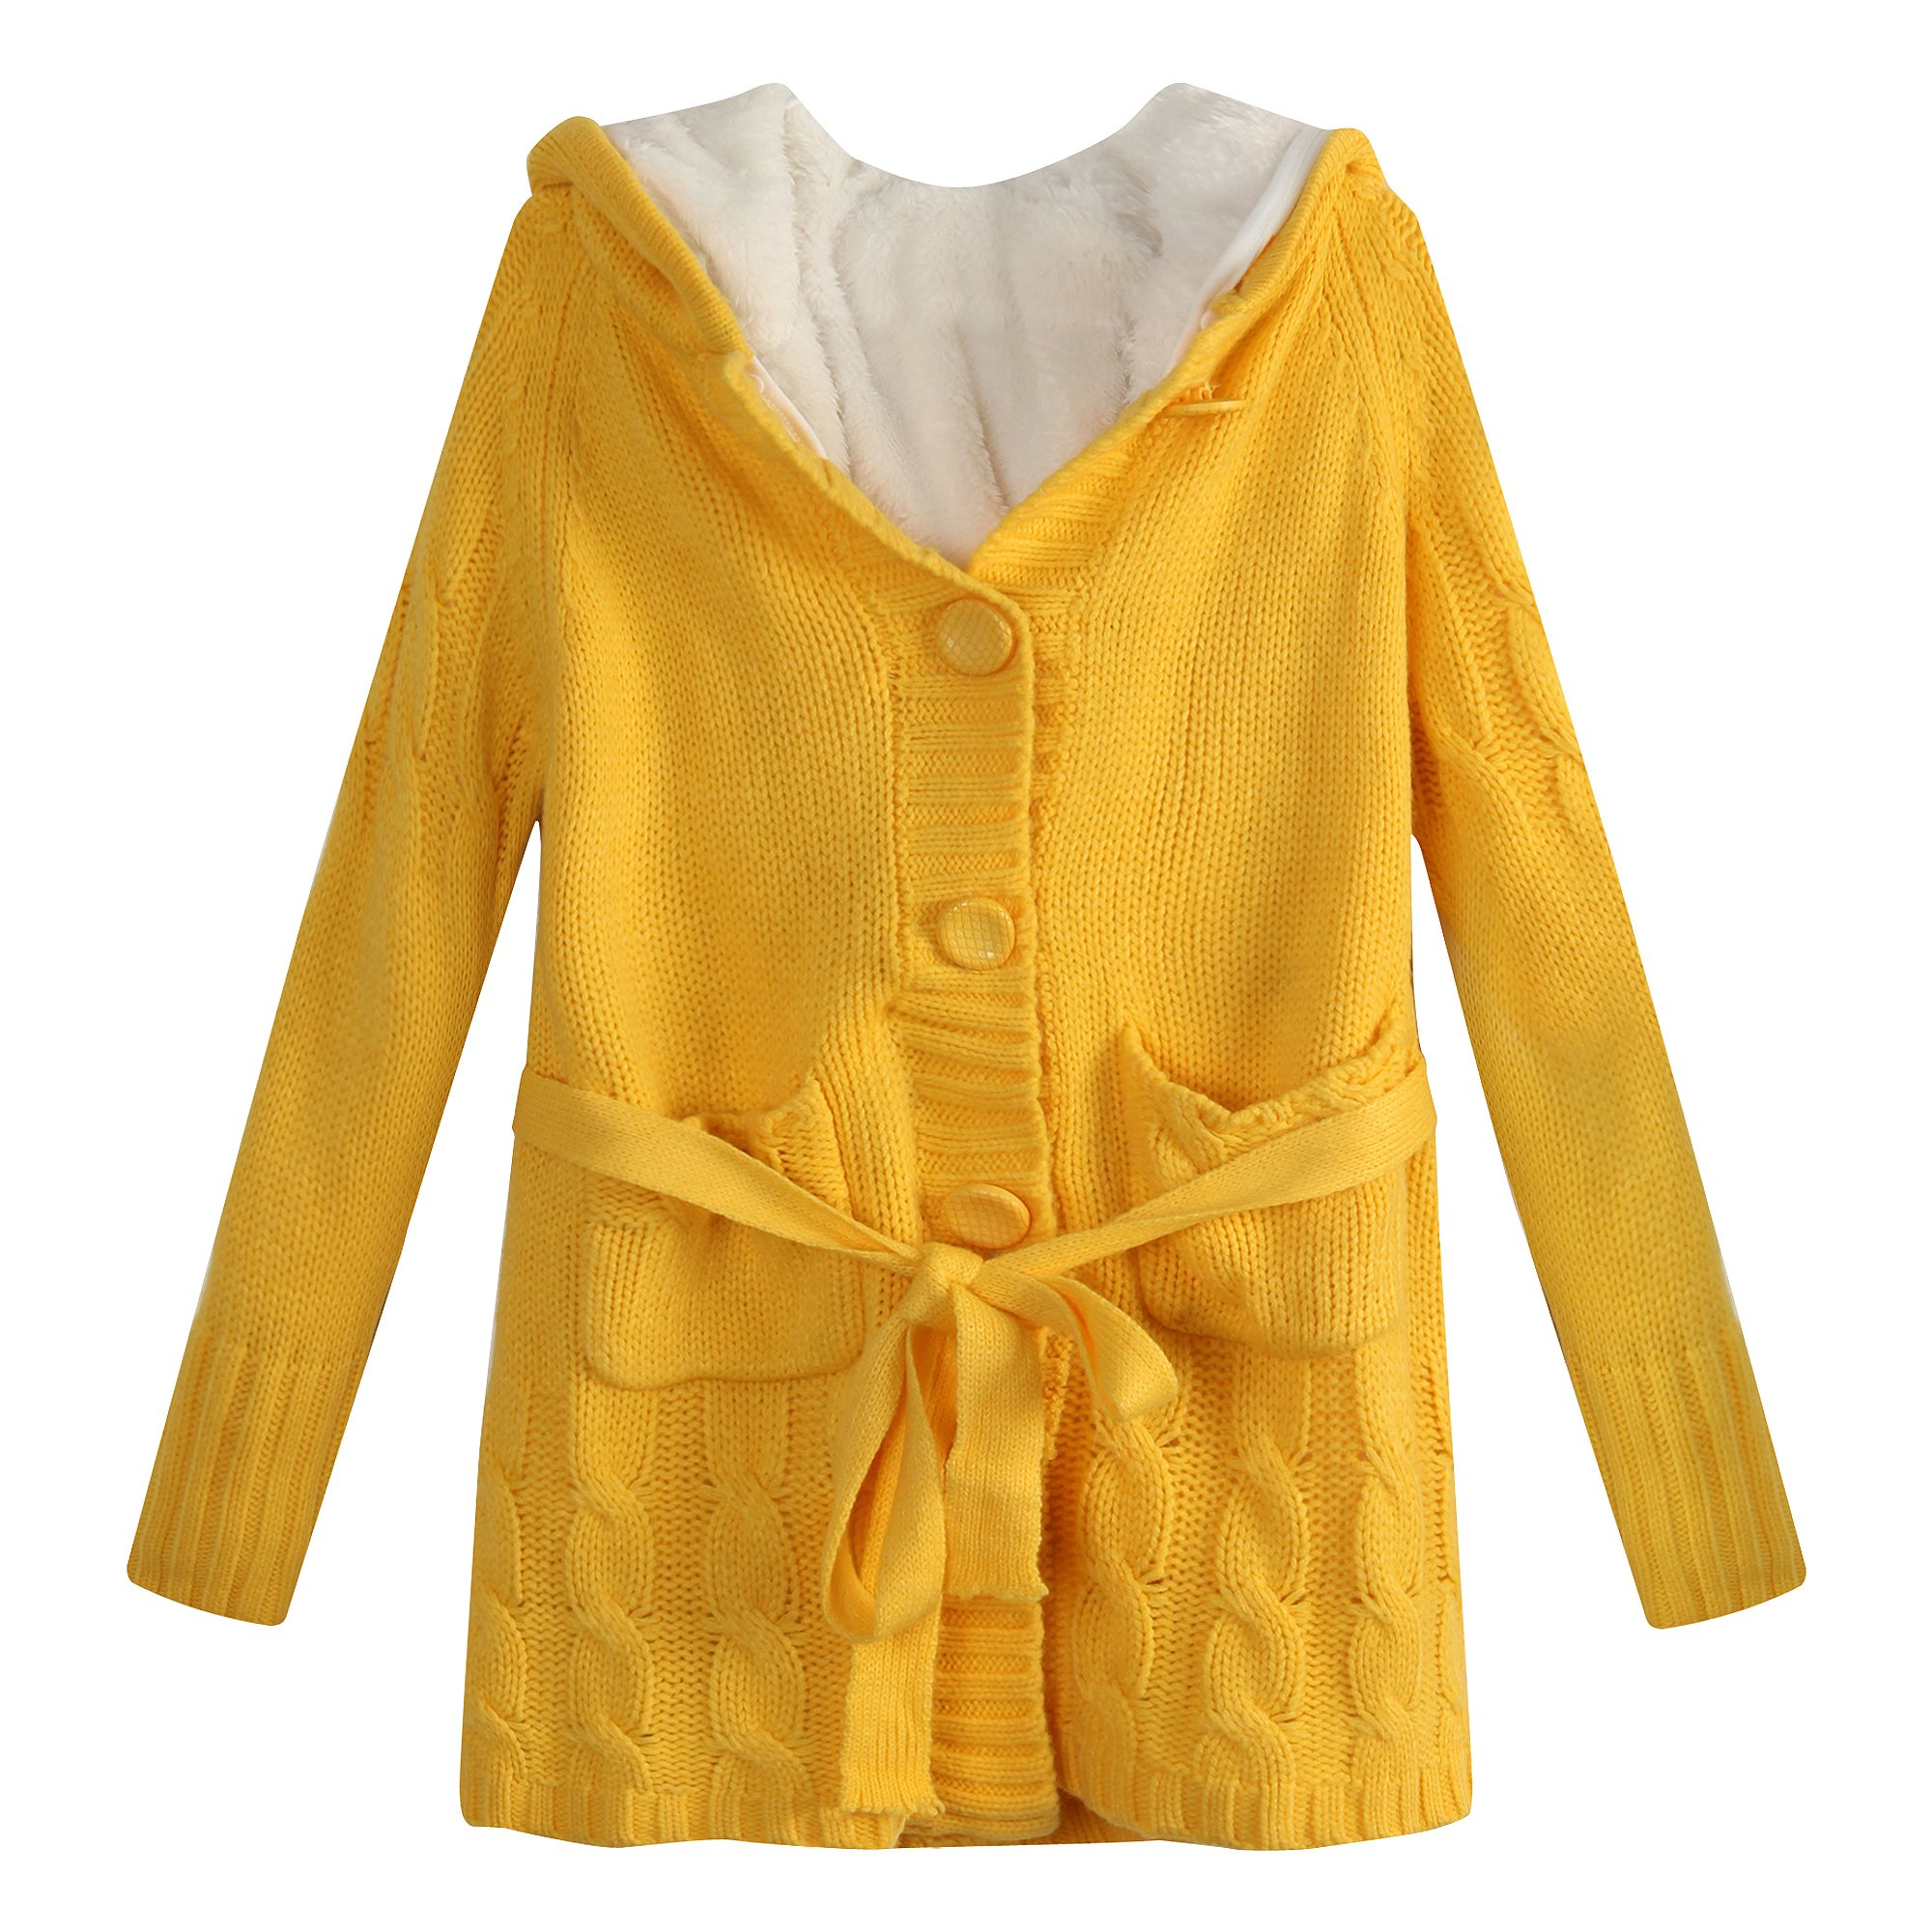 Richie House Big Girls' cardigan sweater with short floss lining RH1009-B-7/8